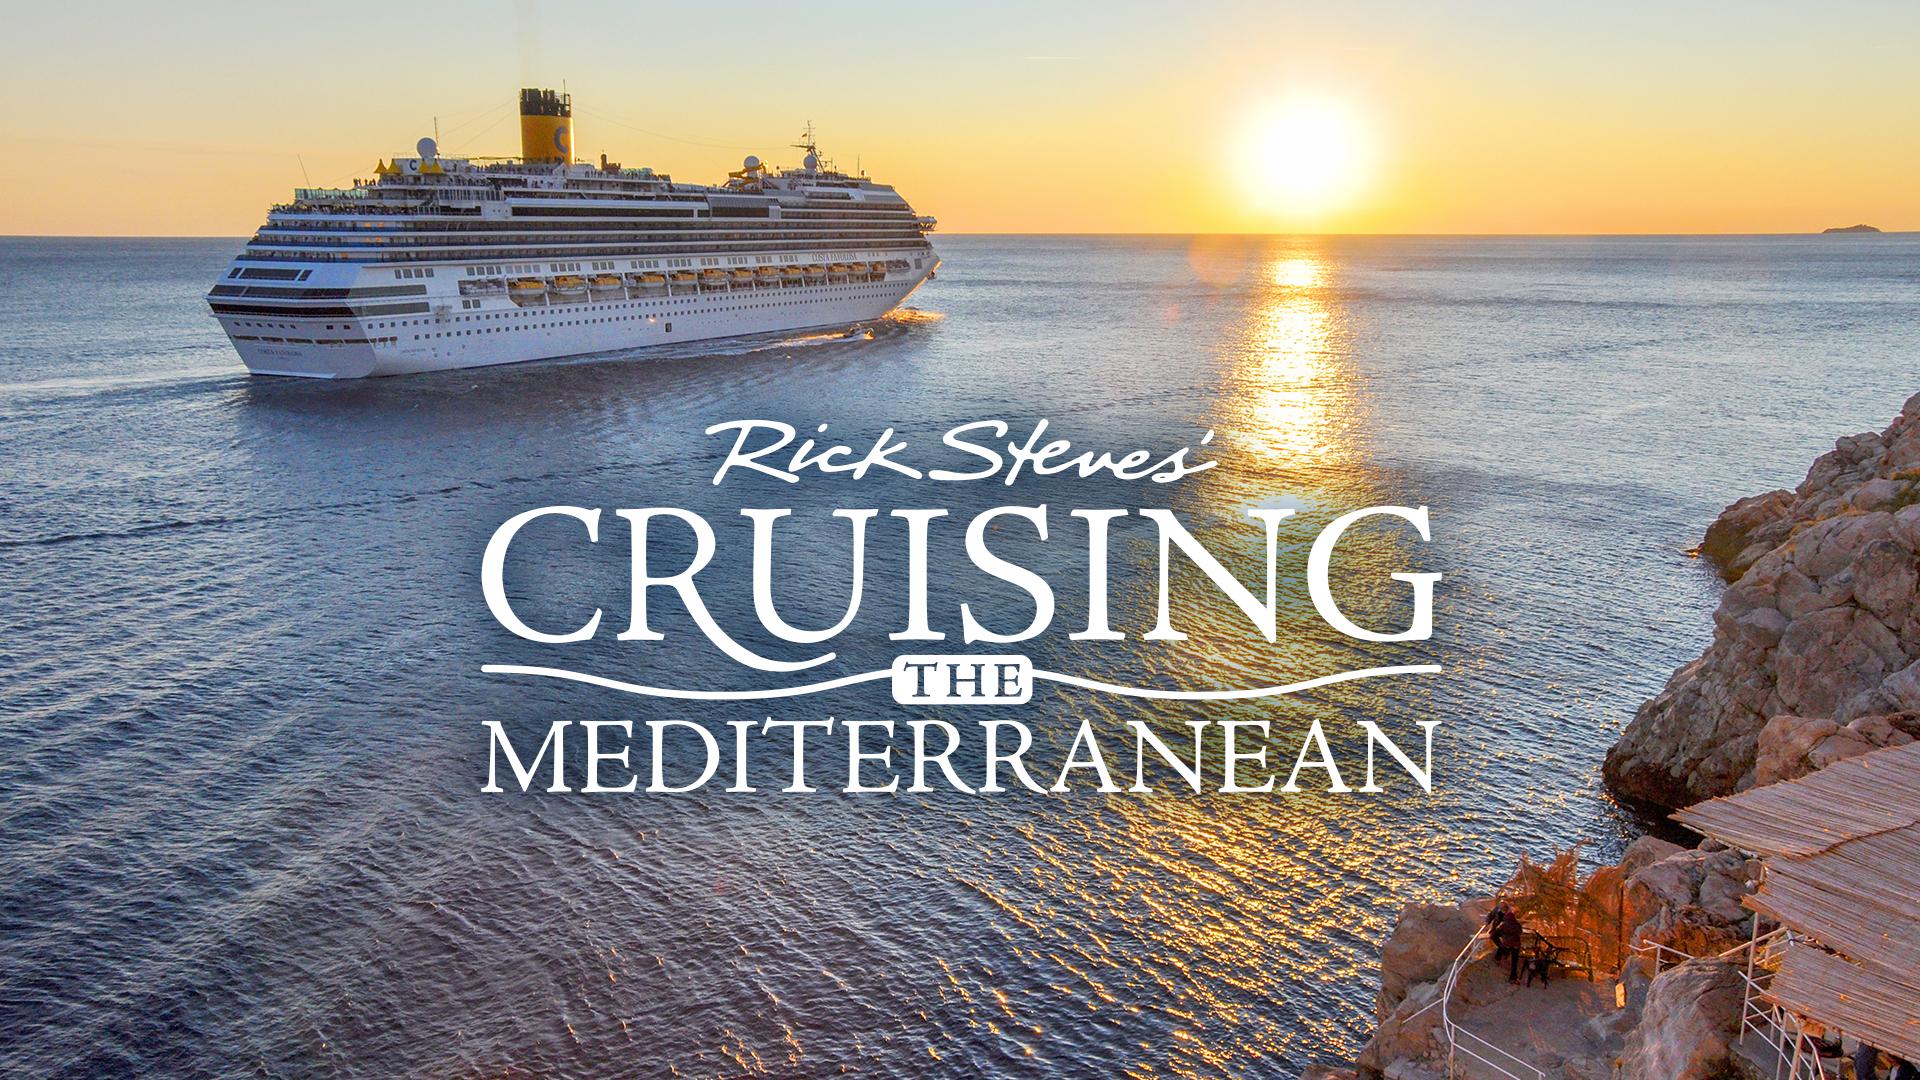 RICK STEVES CRUISING THE MEDITERRANEAN